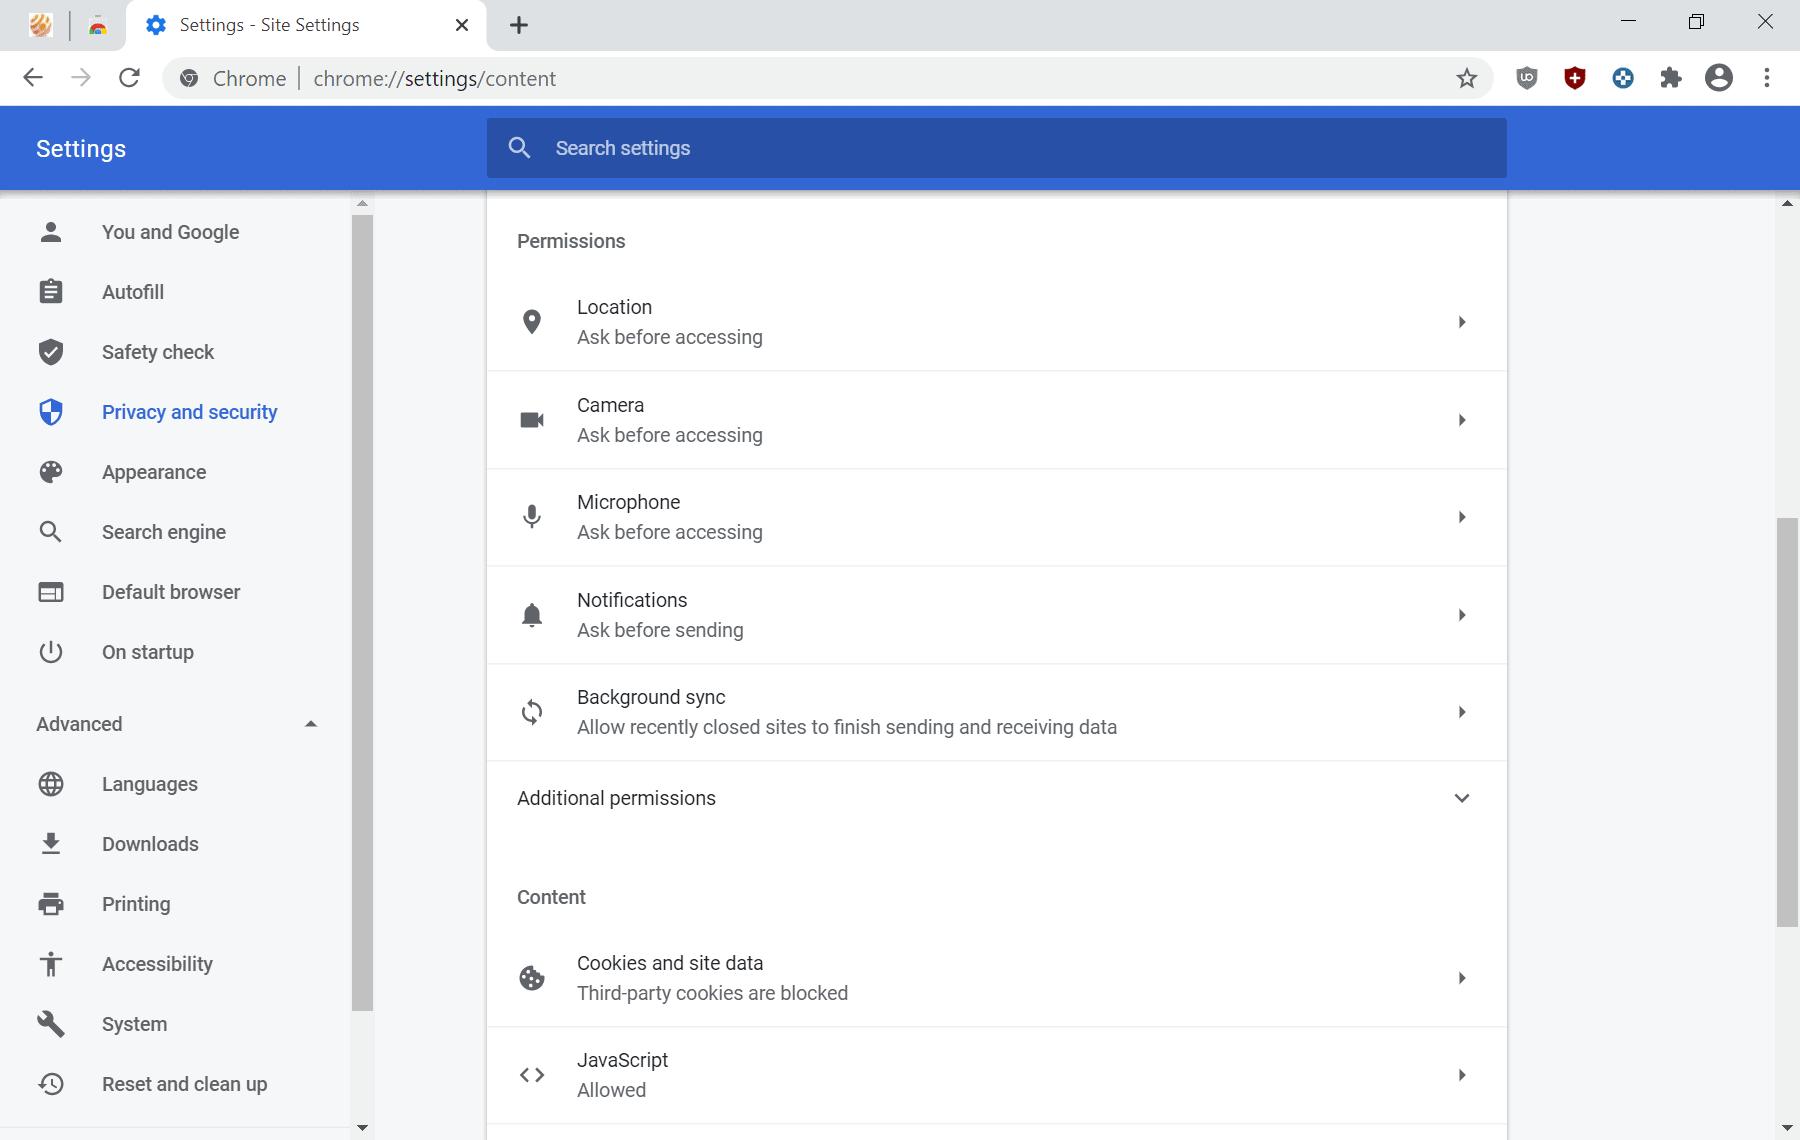 cchrome-83-site-settings.png